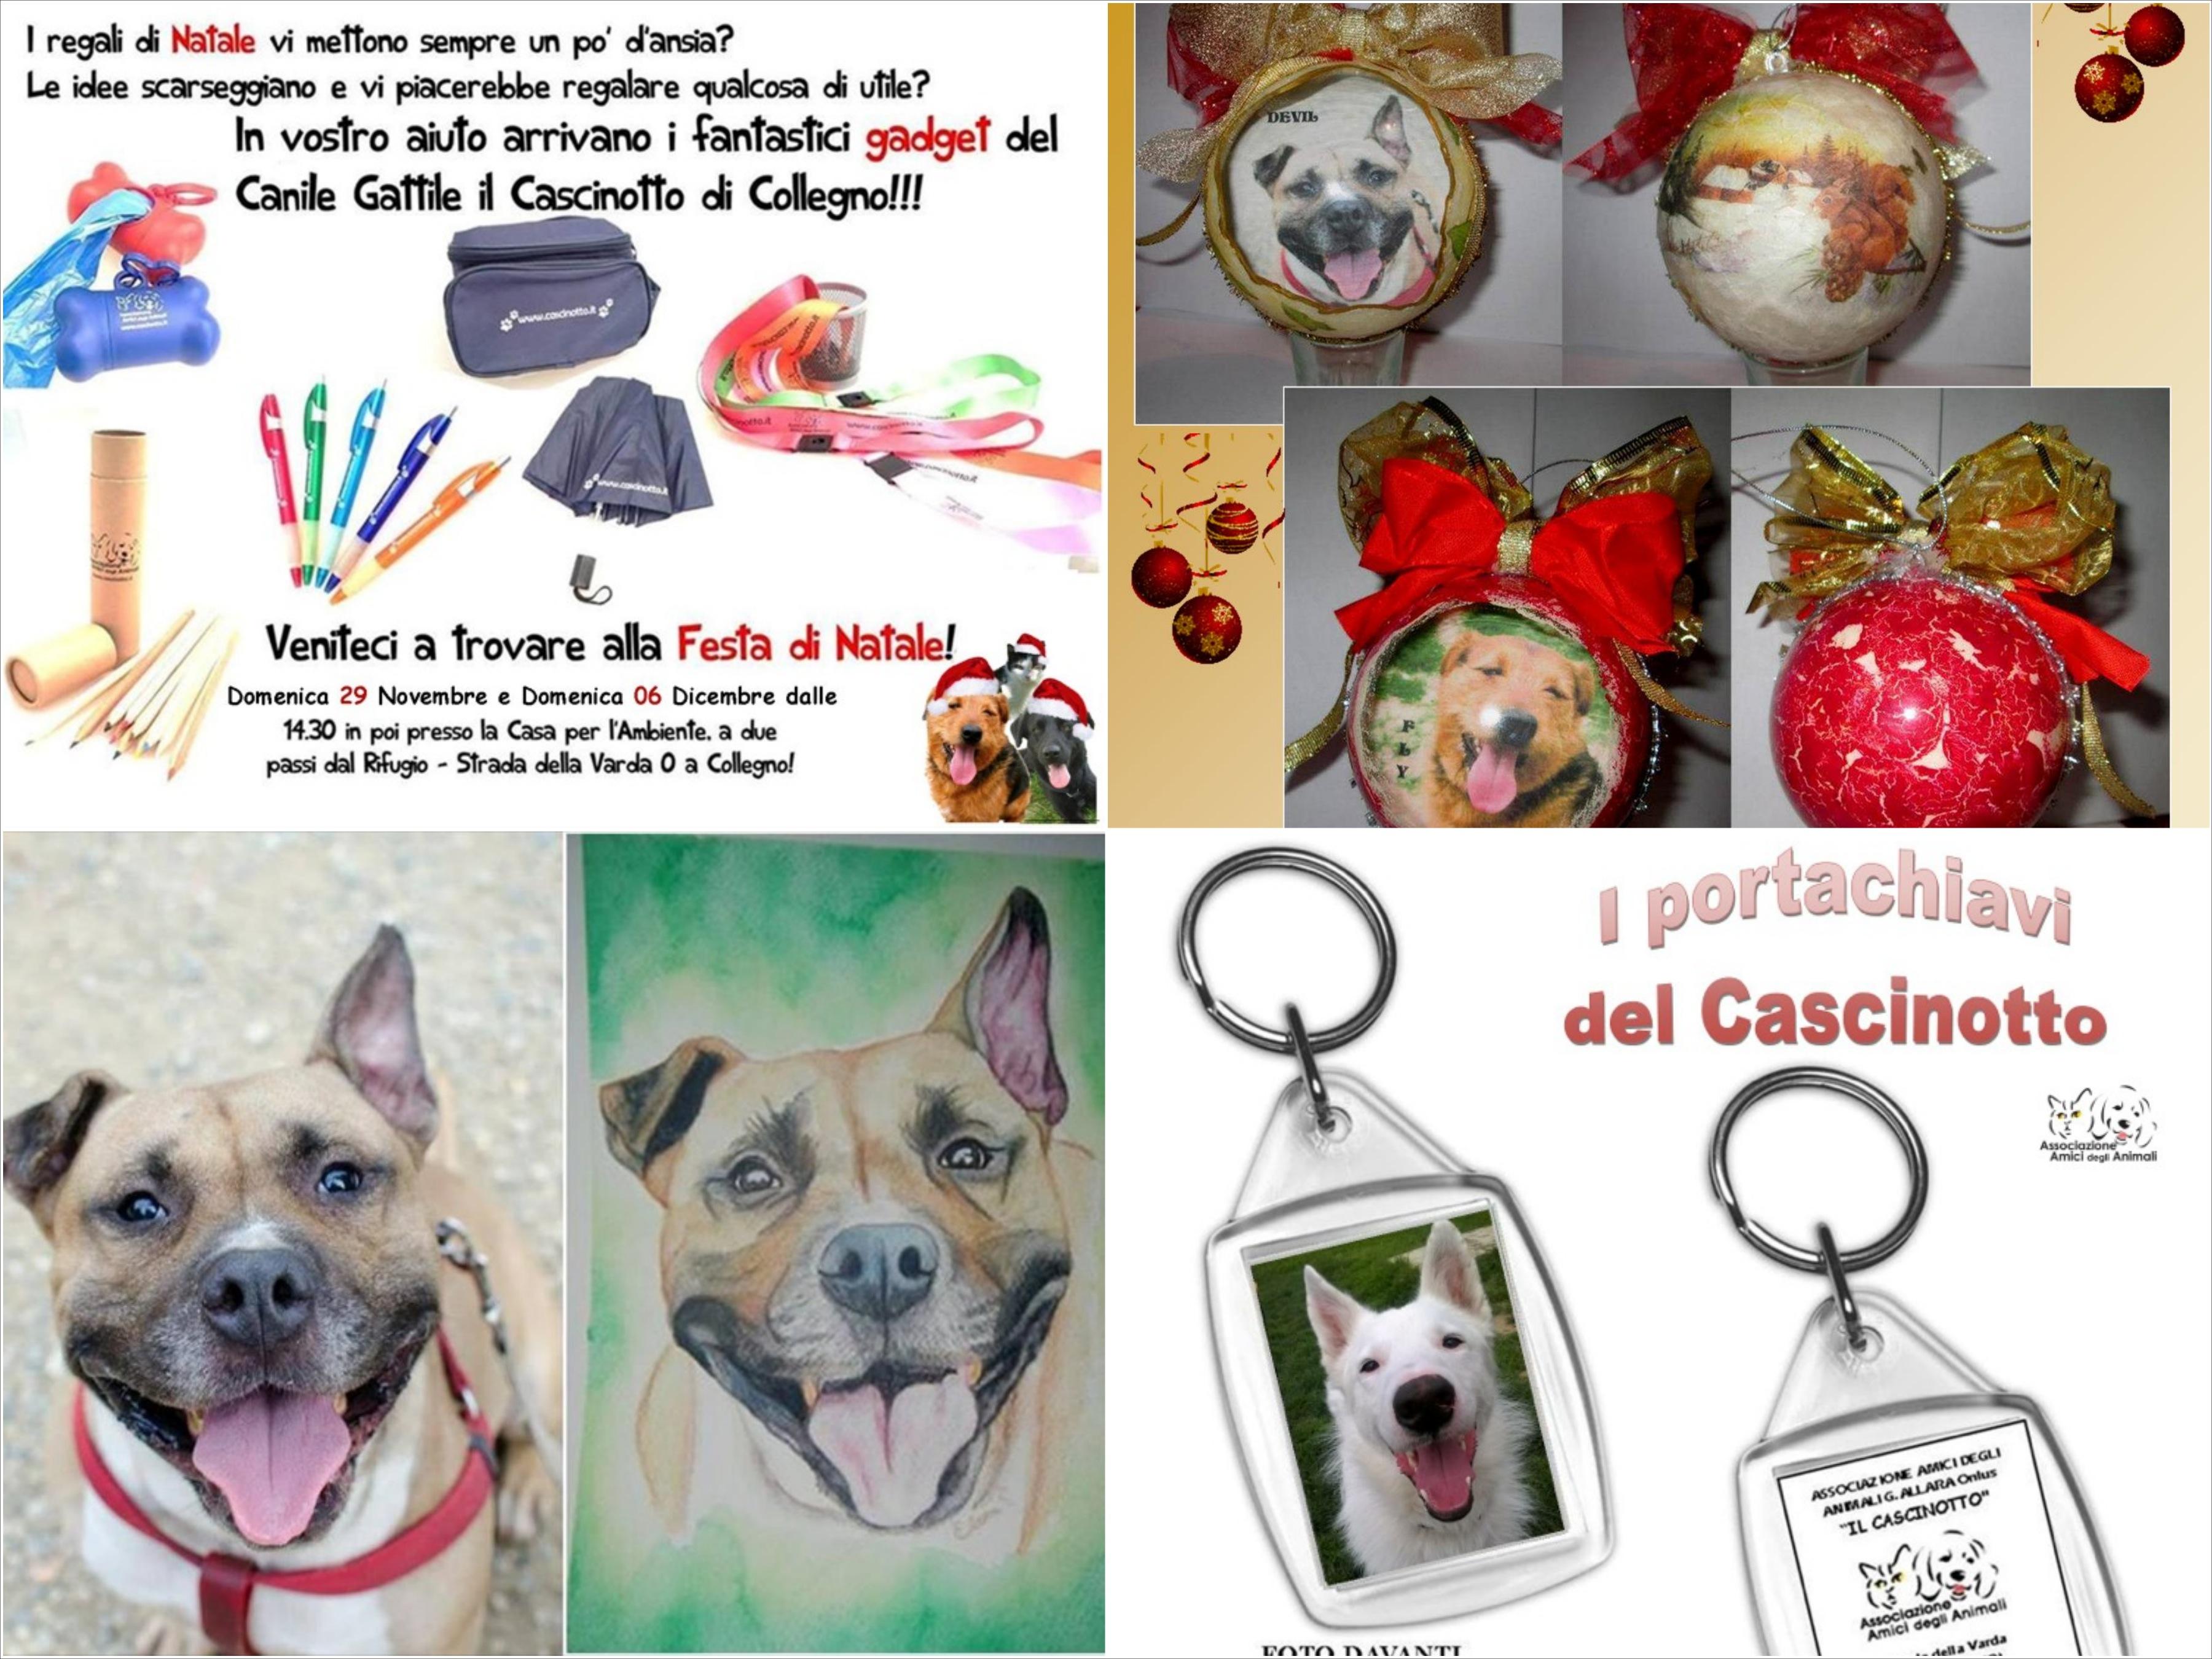 gadget_vari_cascinotto